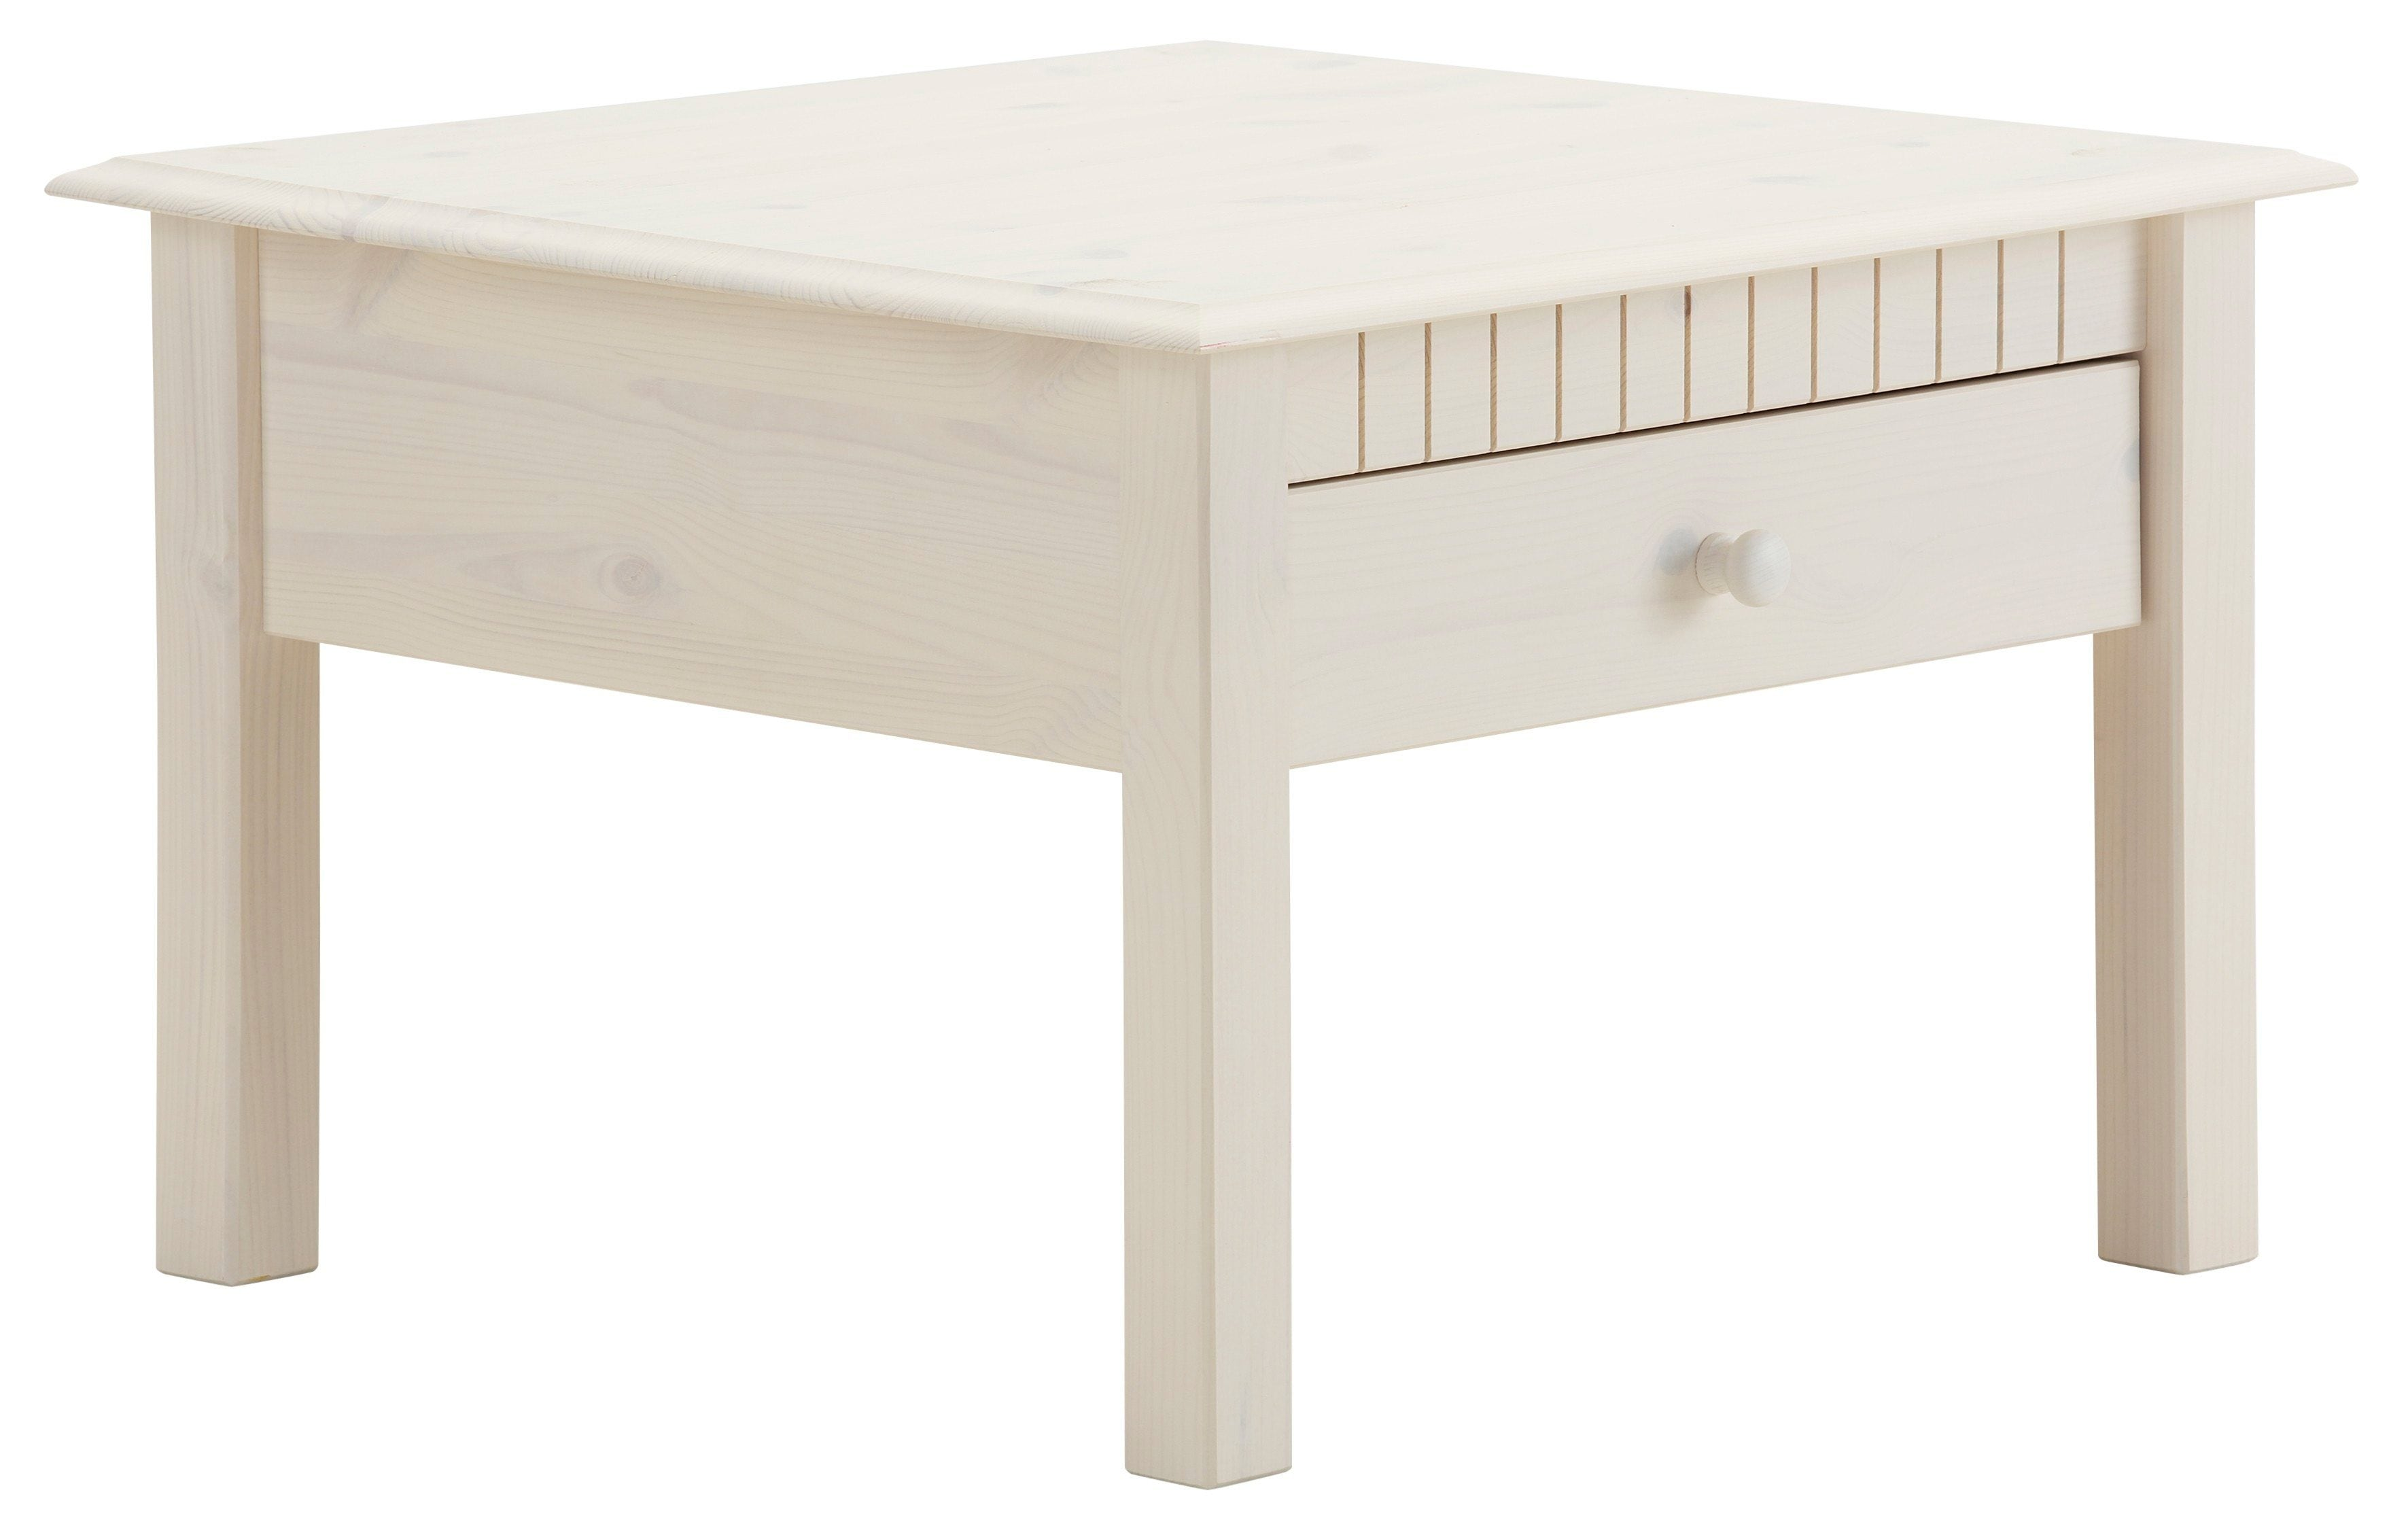 couchtisch home affaire breite 60 cm task jugendhilfe. Black Bedroom Furniture Sets. Home Design Ideas